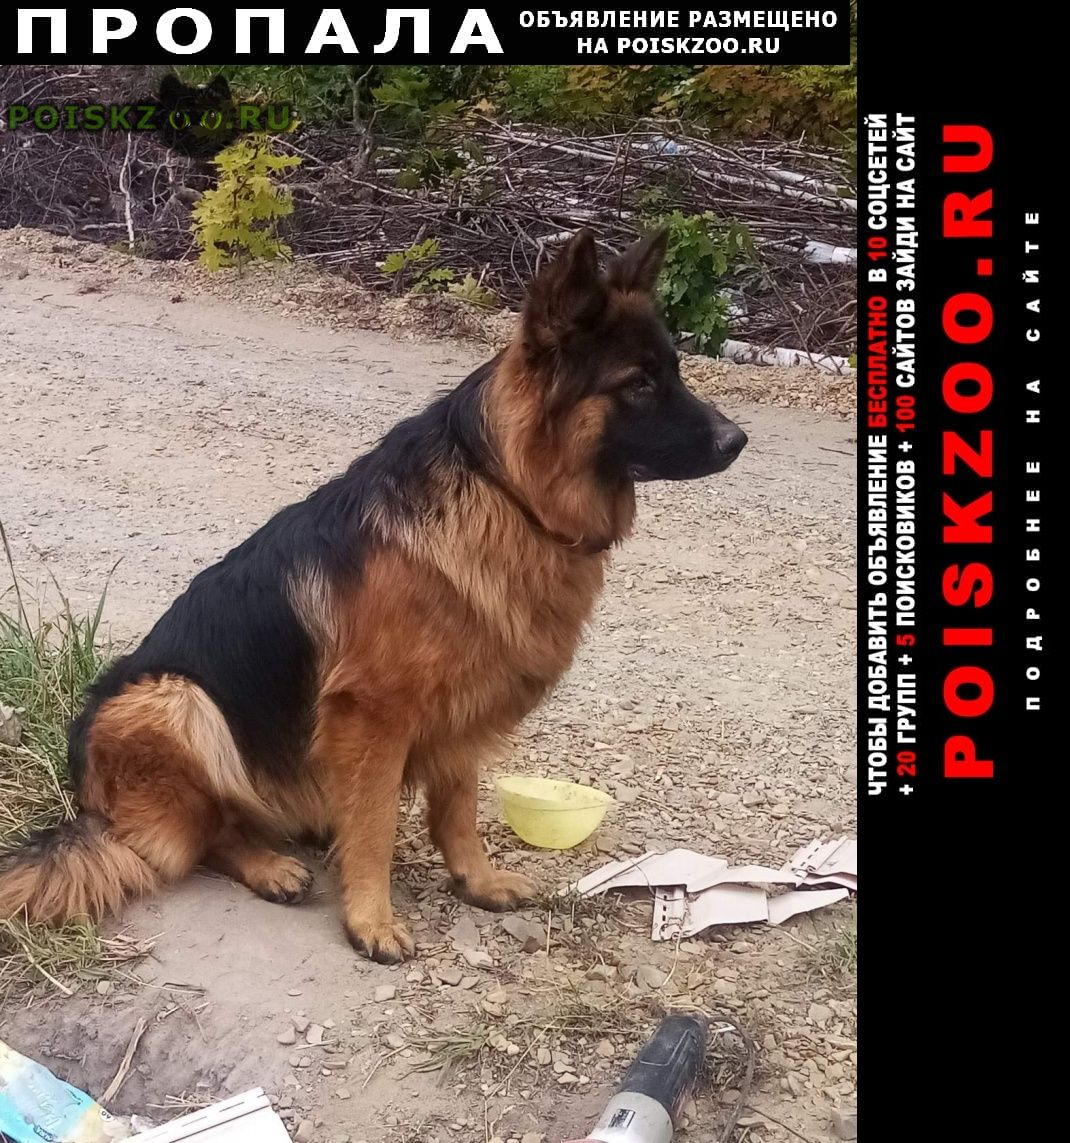 Пропала собака кобель немецкой овчарки г.Пенза